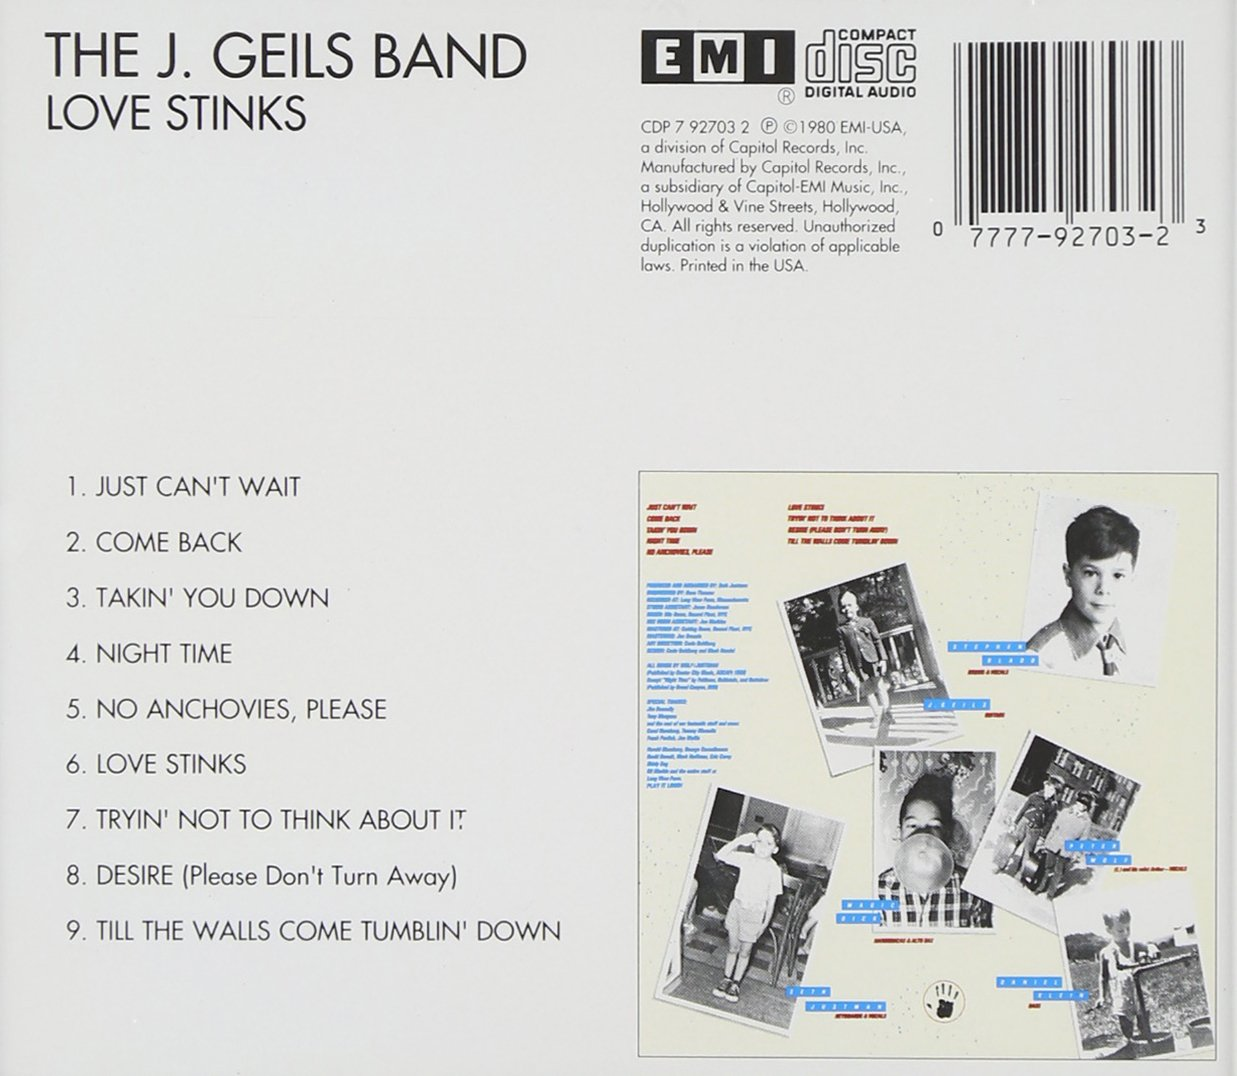 J. Geils Band - Love Stinks - Amazon.com Music